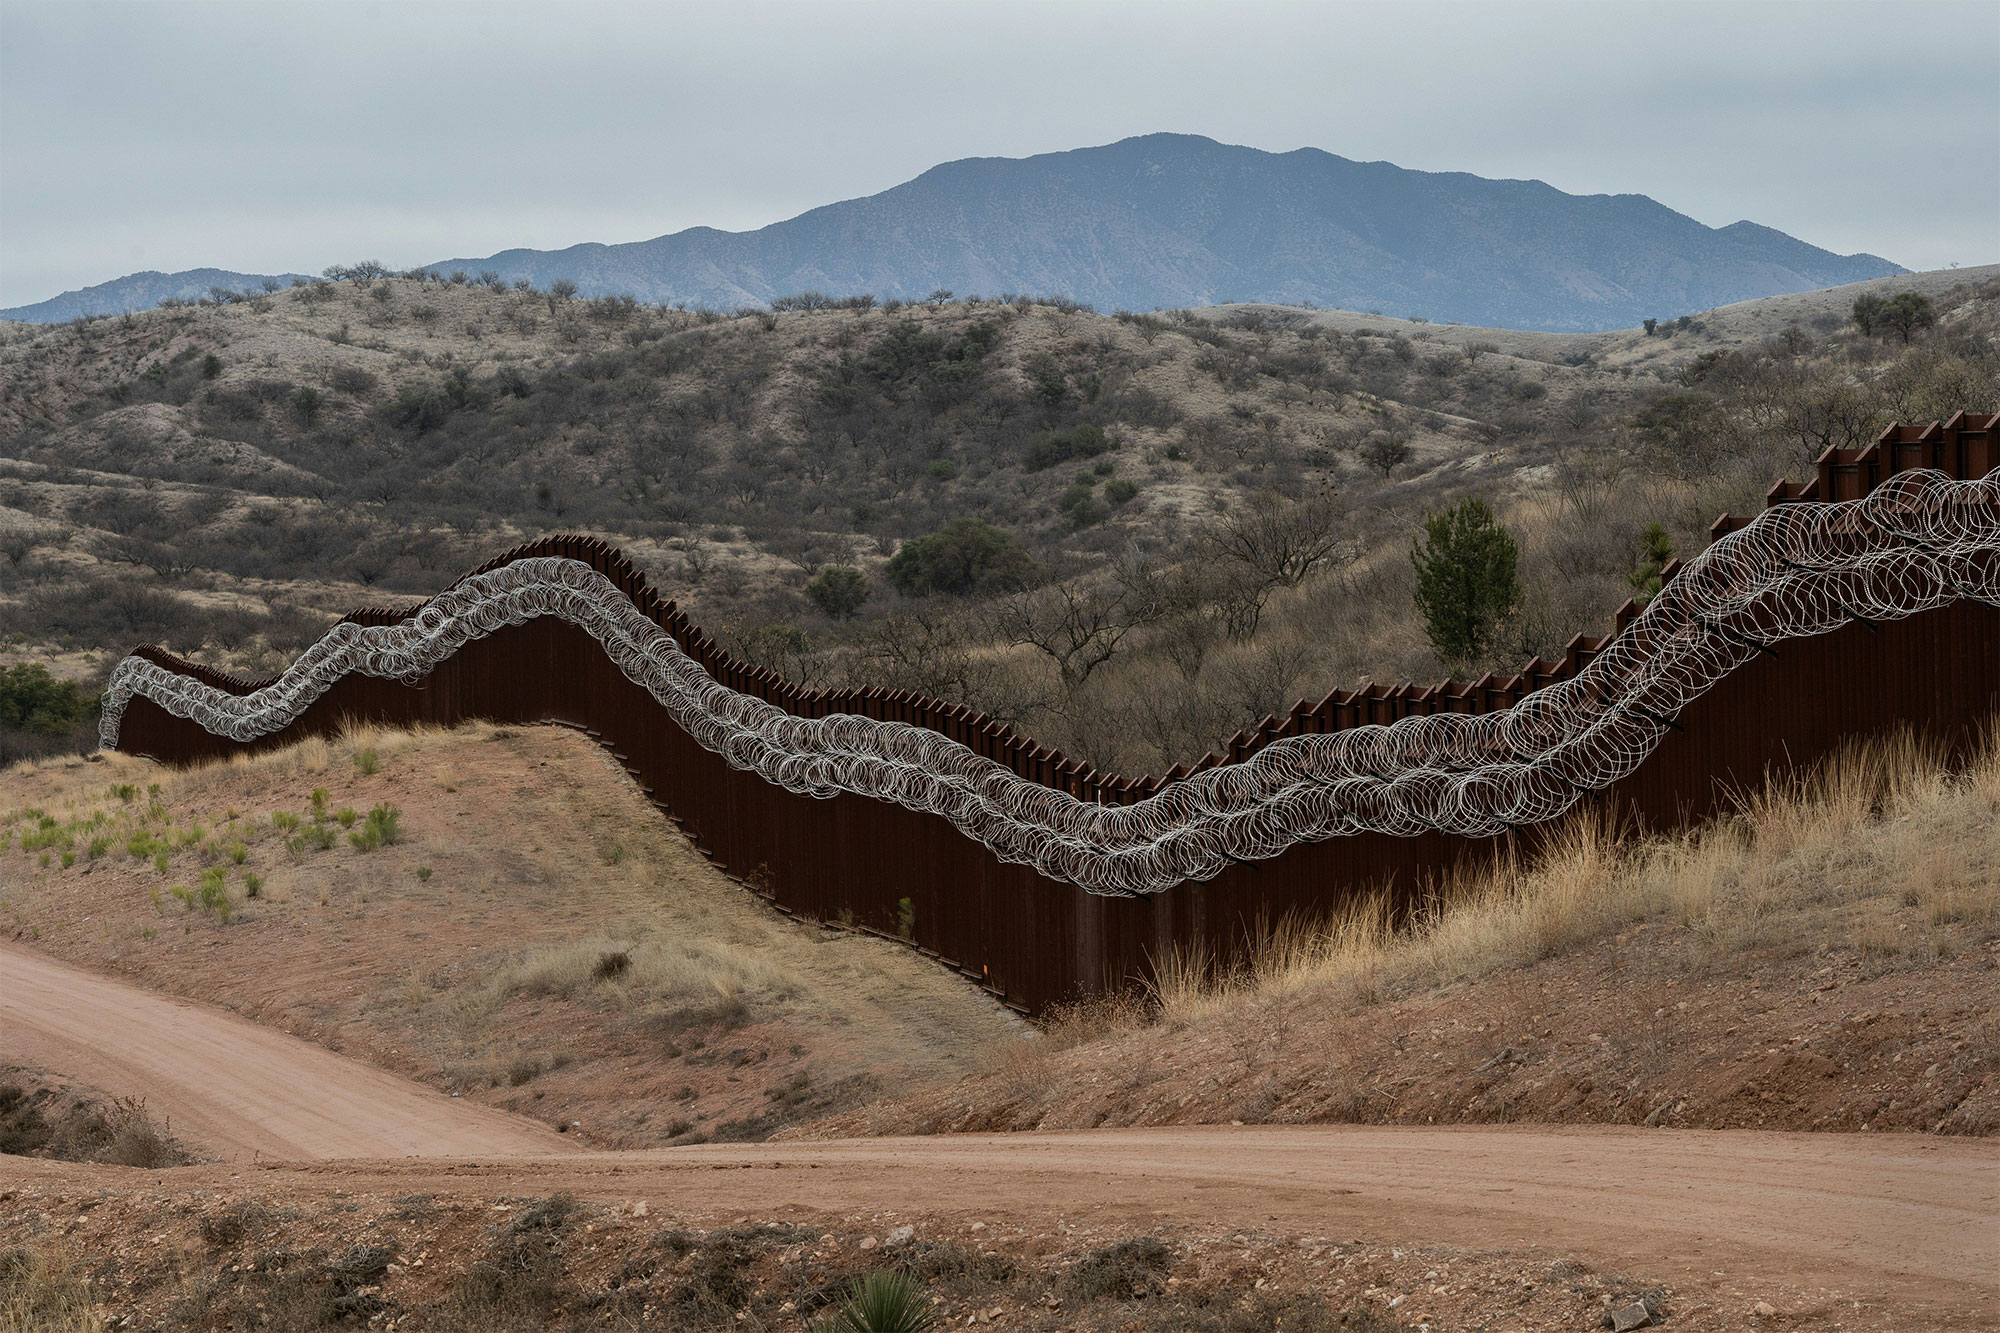 TOPSHOT-US-MEXICO-BORDER-FENCE